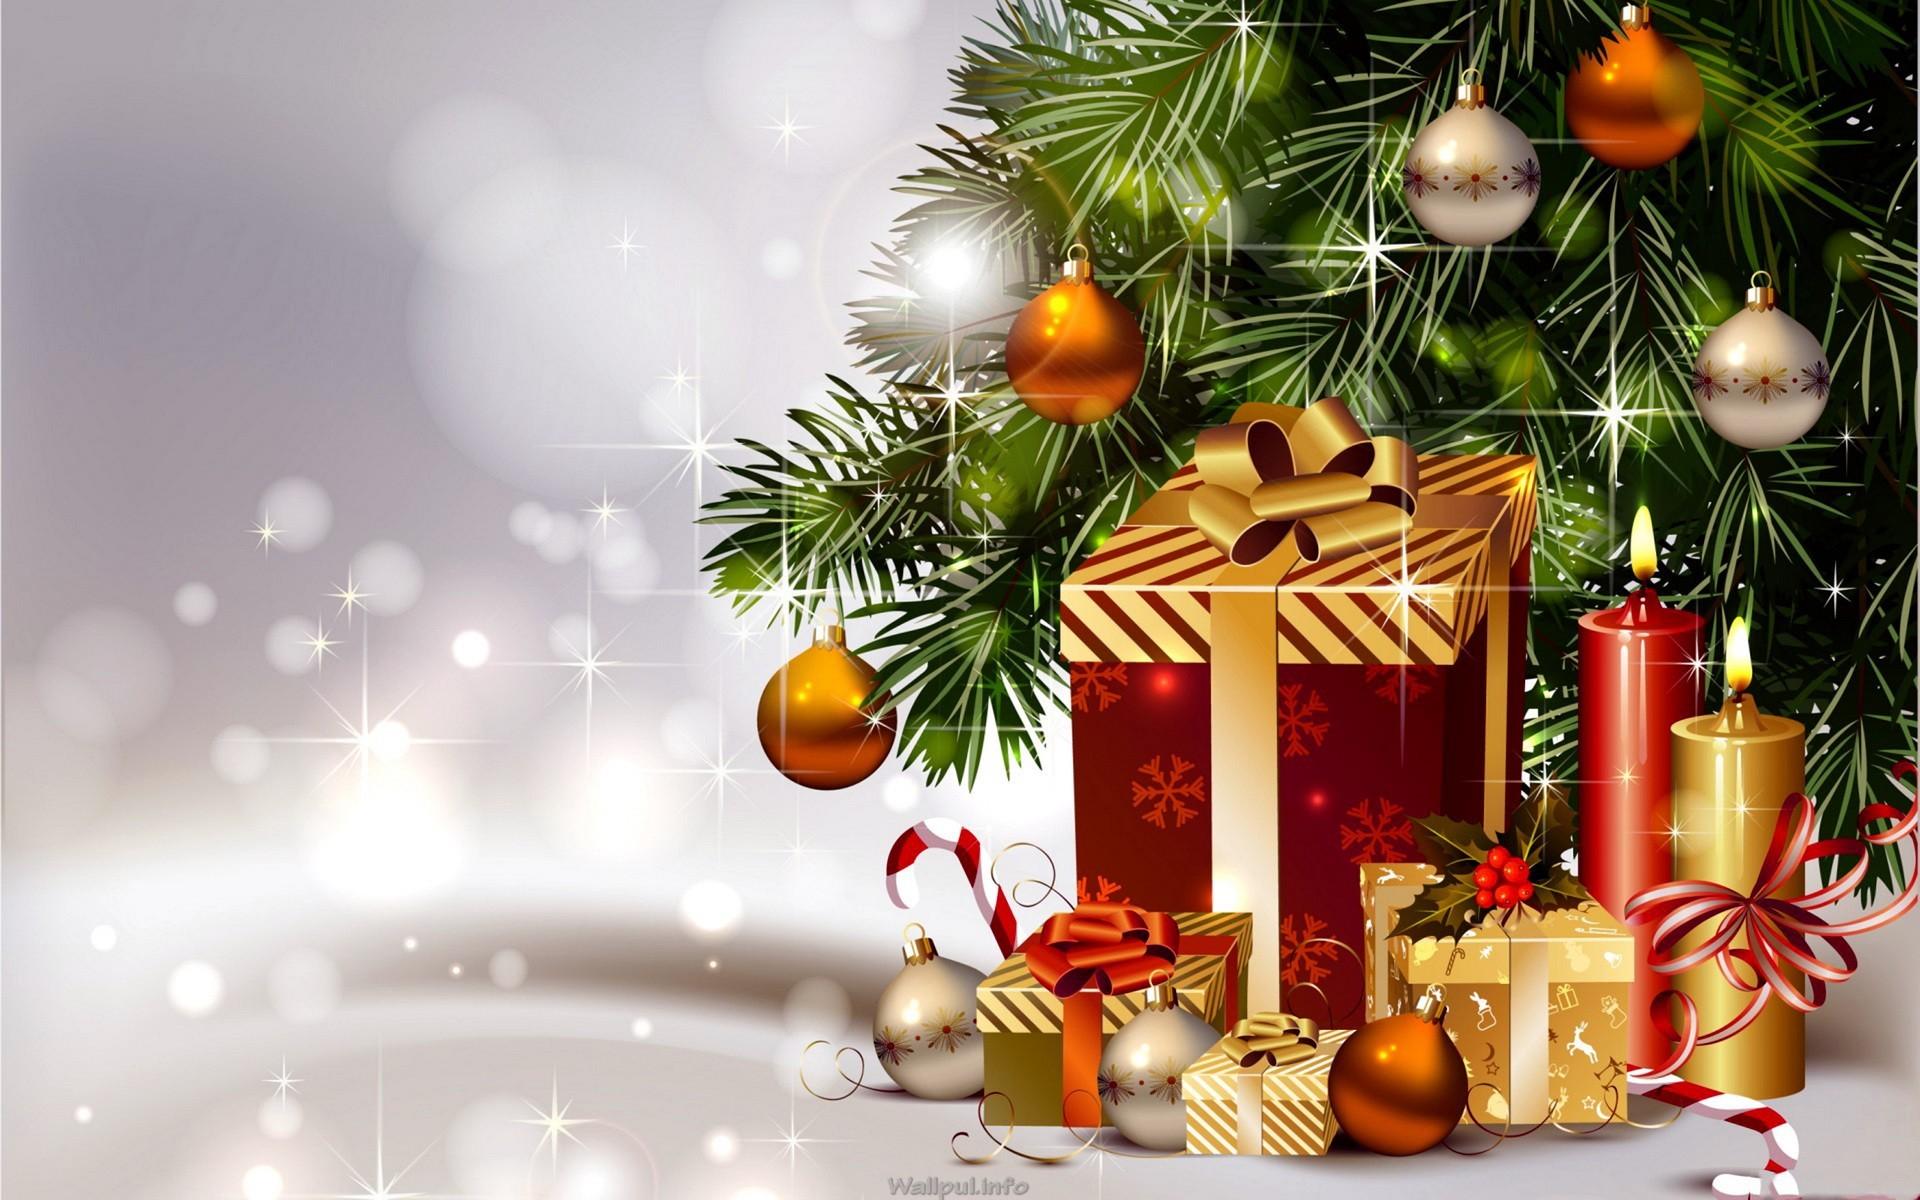 … Celebration Christmas Wallpaper Widescreen Hd Wallpapers …